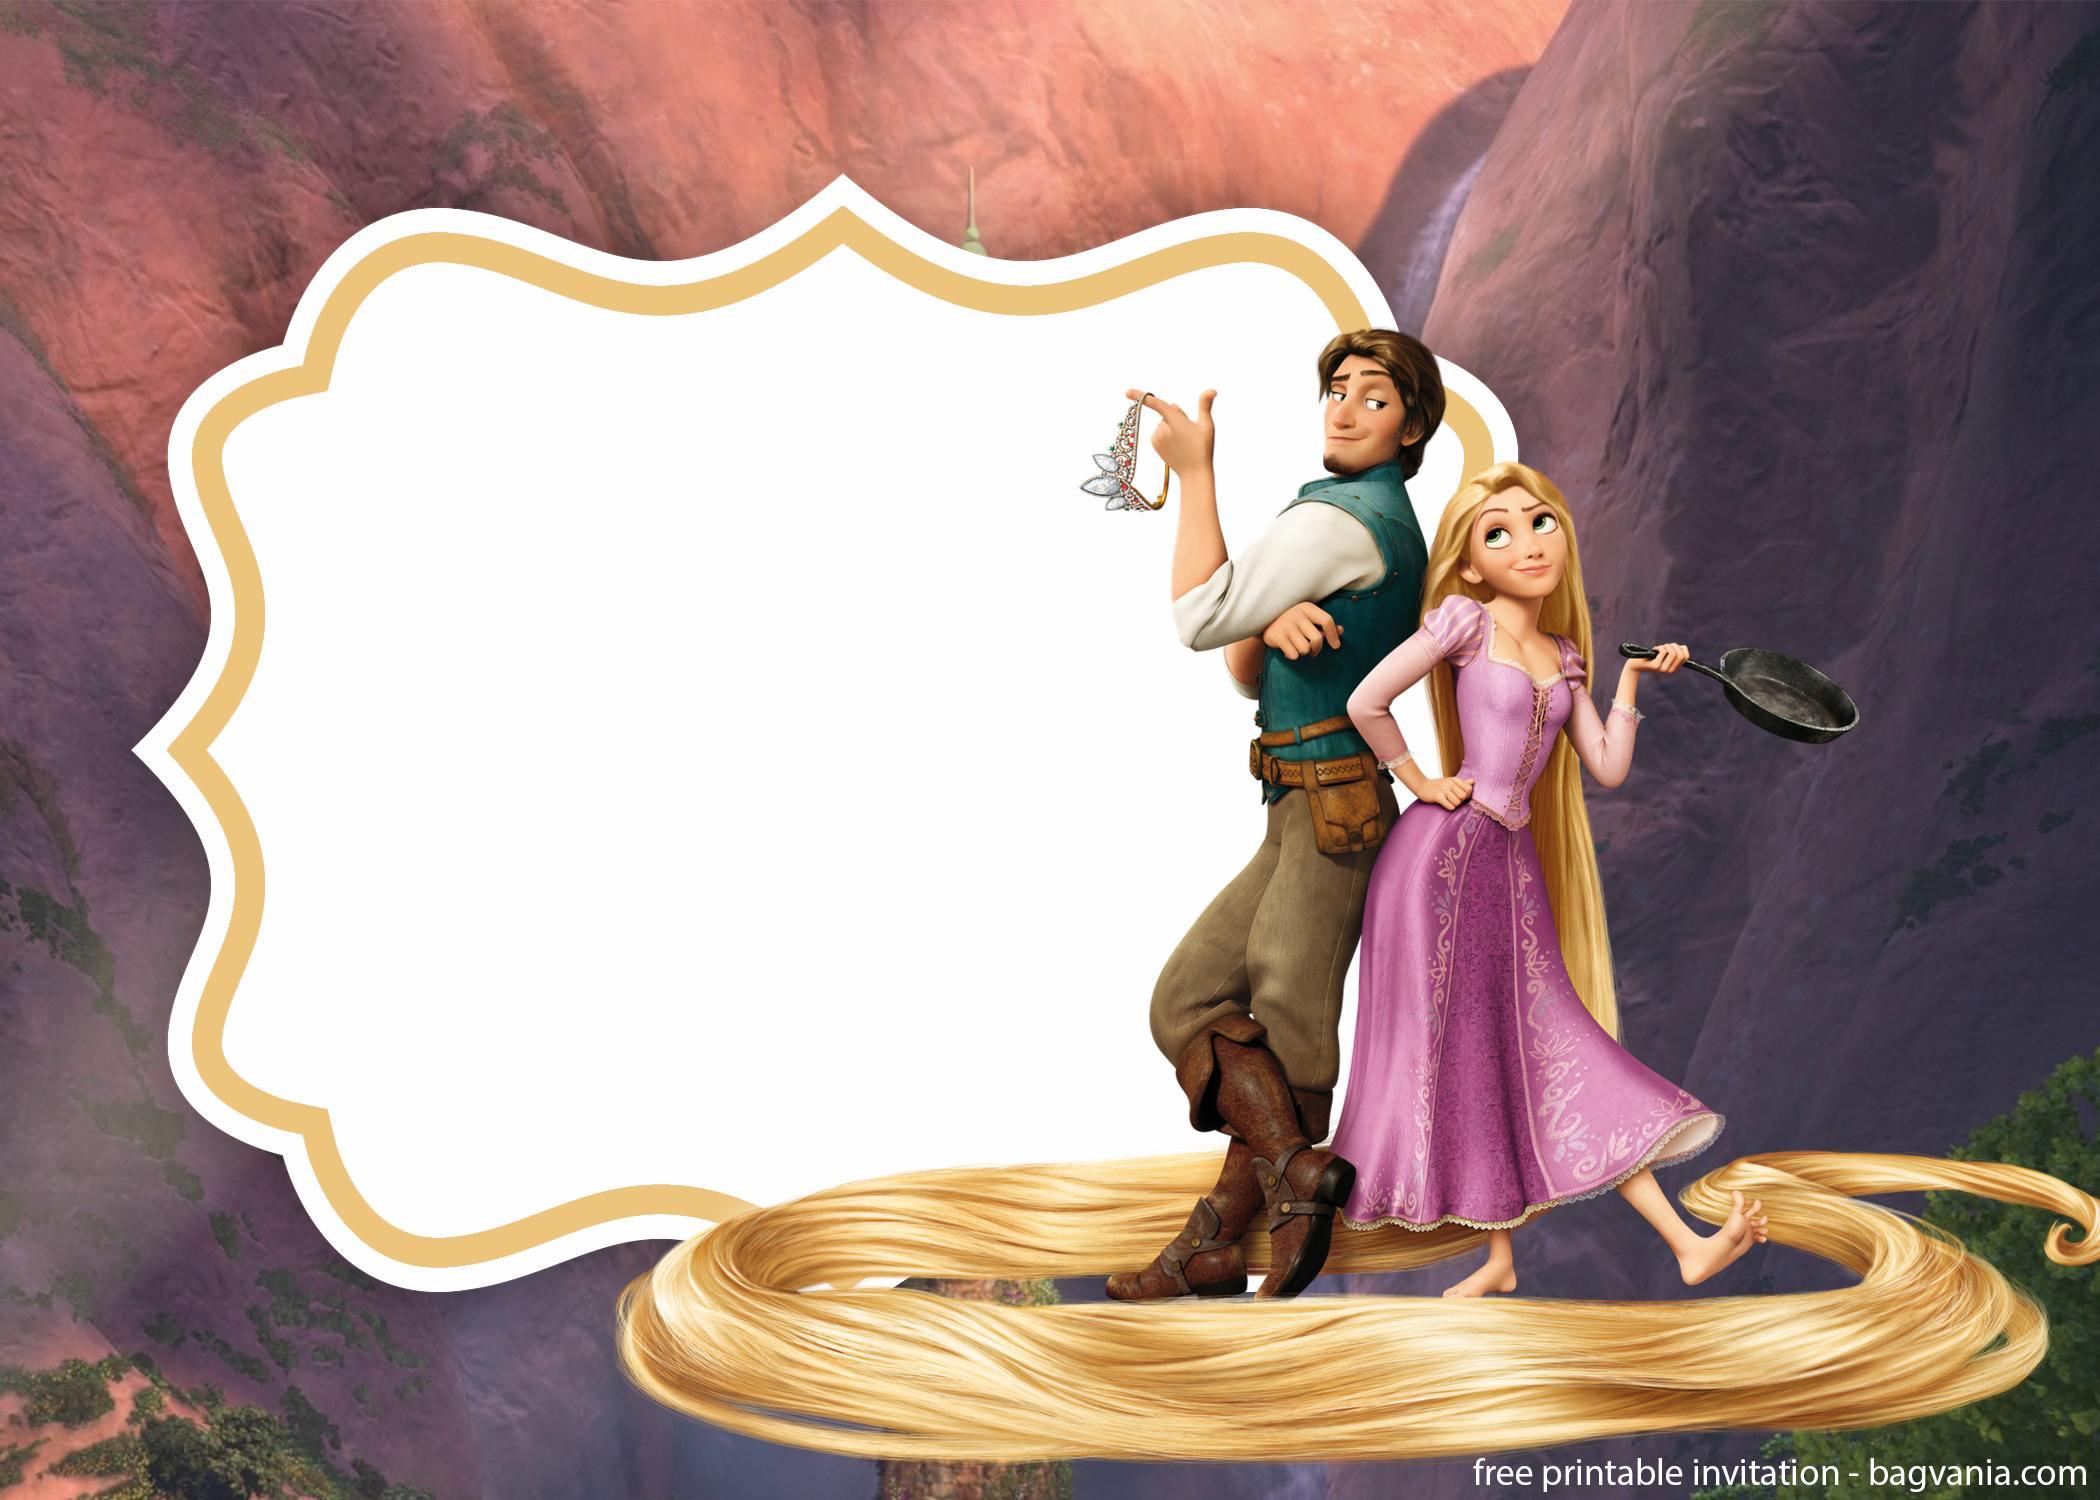 Free Royal Rapunzel Invitation Template Free Printable Birthday Invitation Templates Bagvania